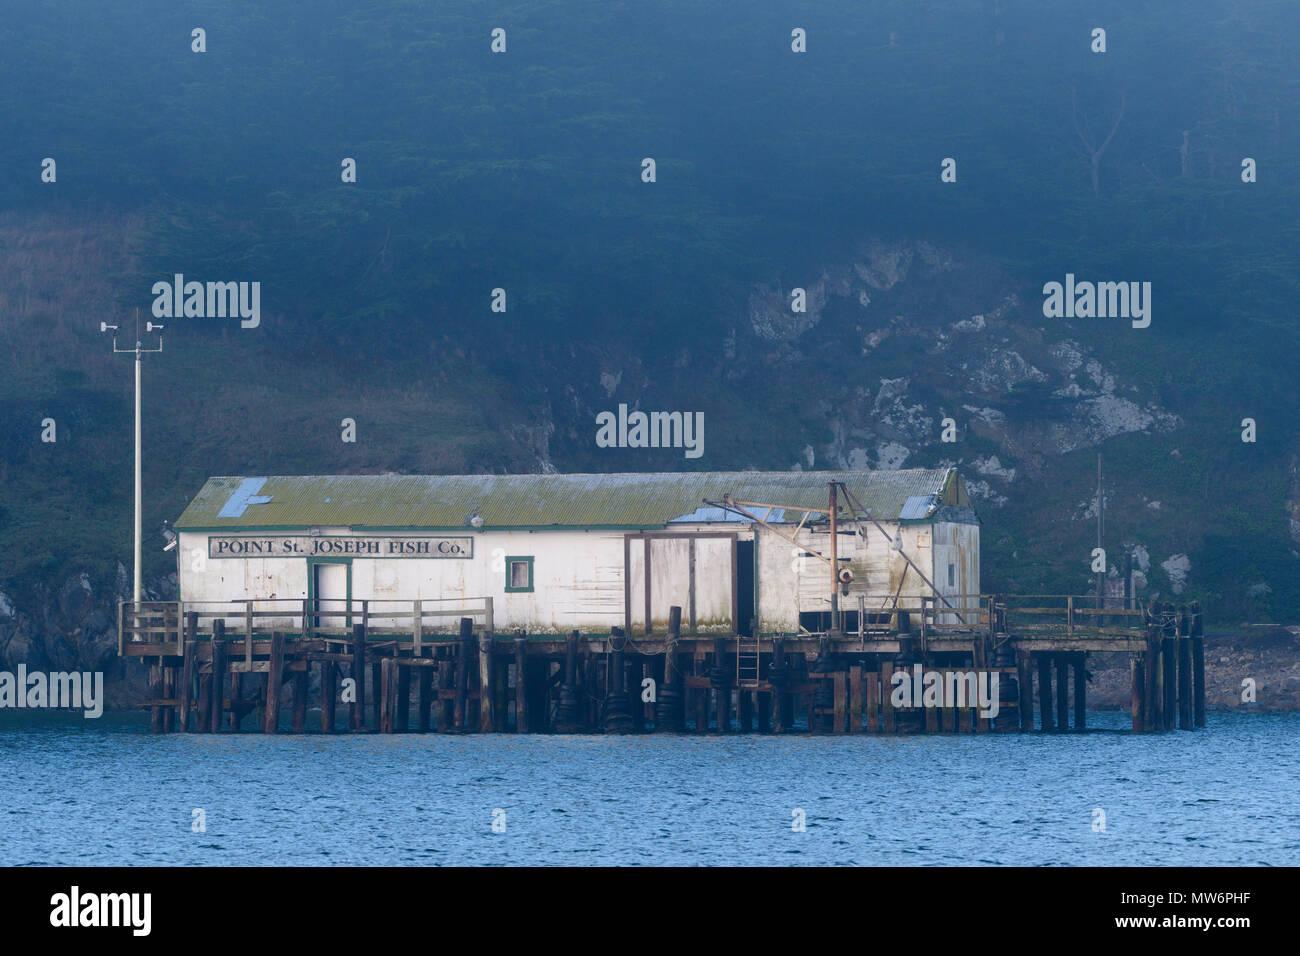 The Point st. joseph fish company building in Drakes Bay, California, USA - Stock Image